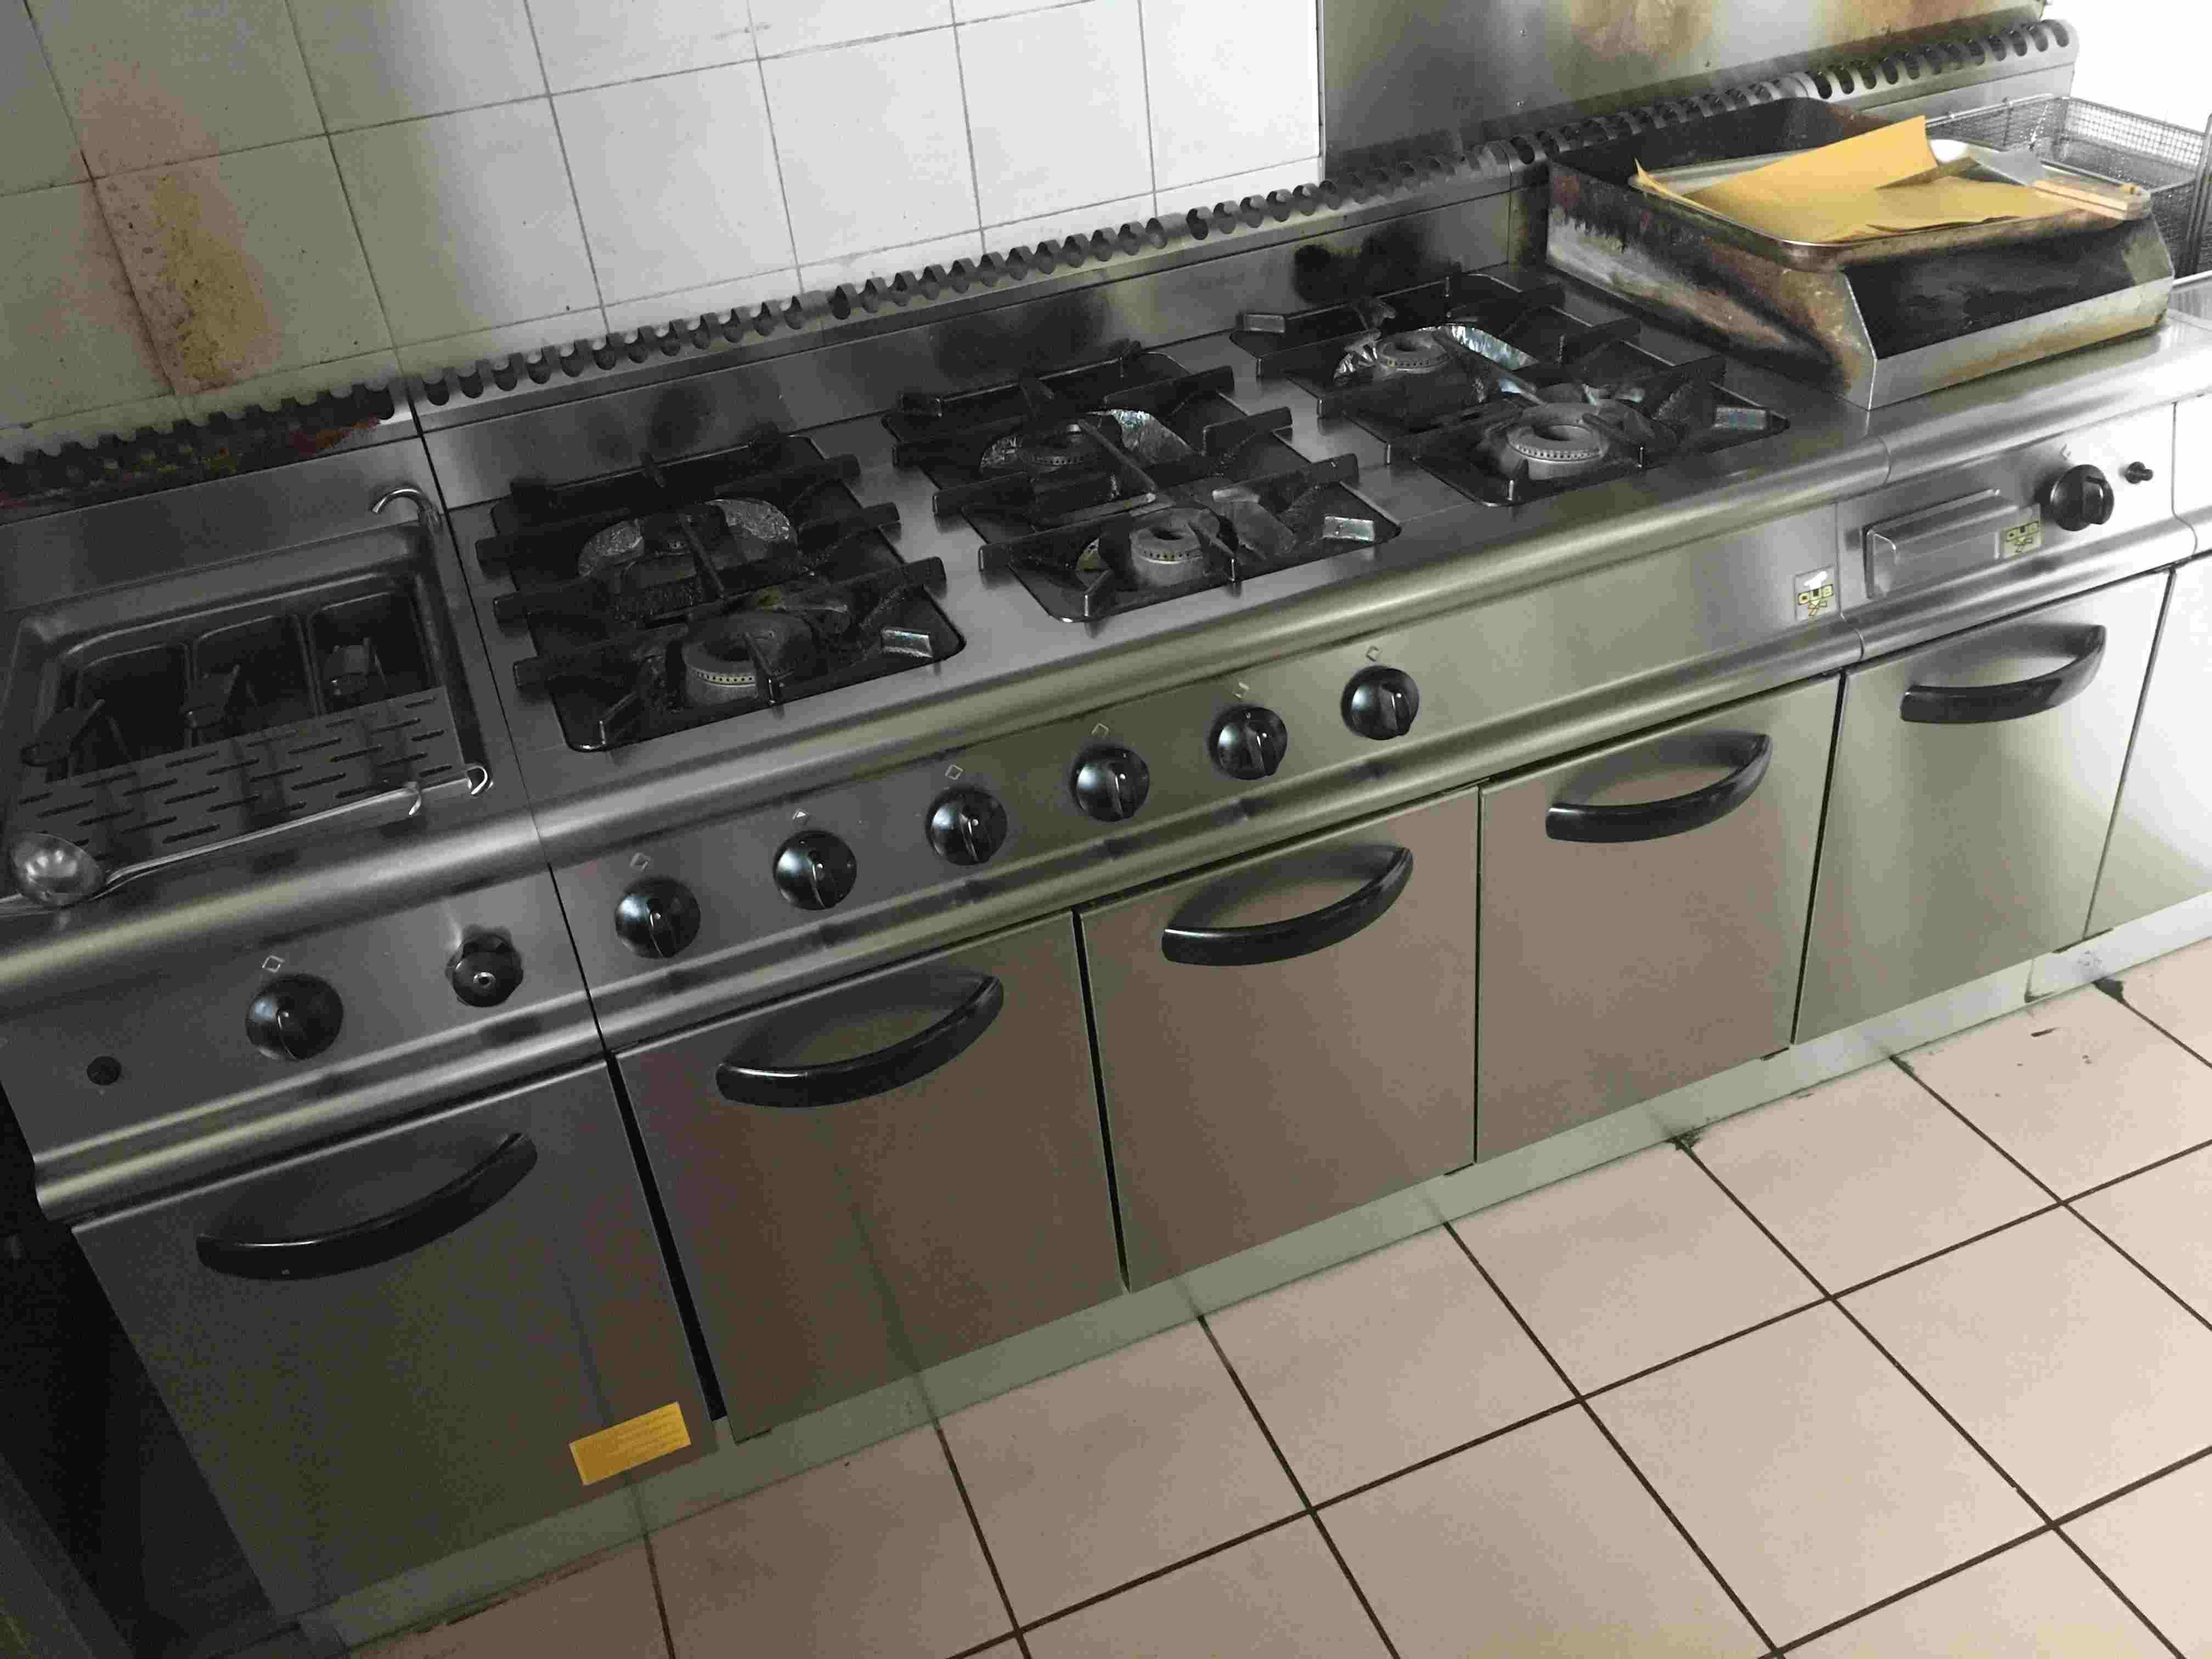 Ikea Cucina Due Fuochi | Piani Cottura Franke Prezzi Piano Cottura ...